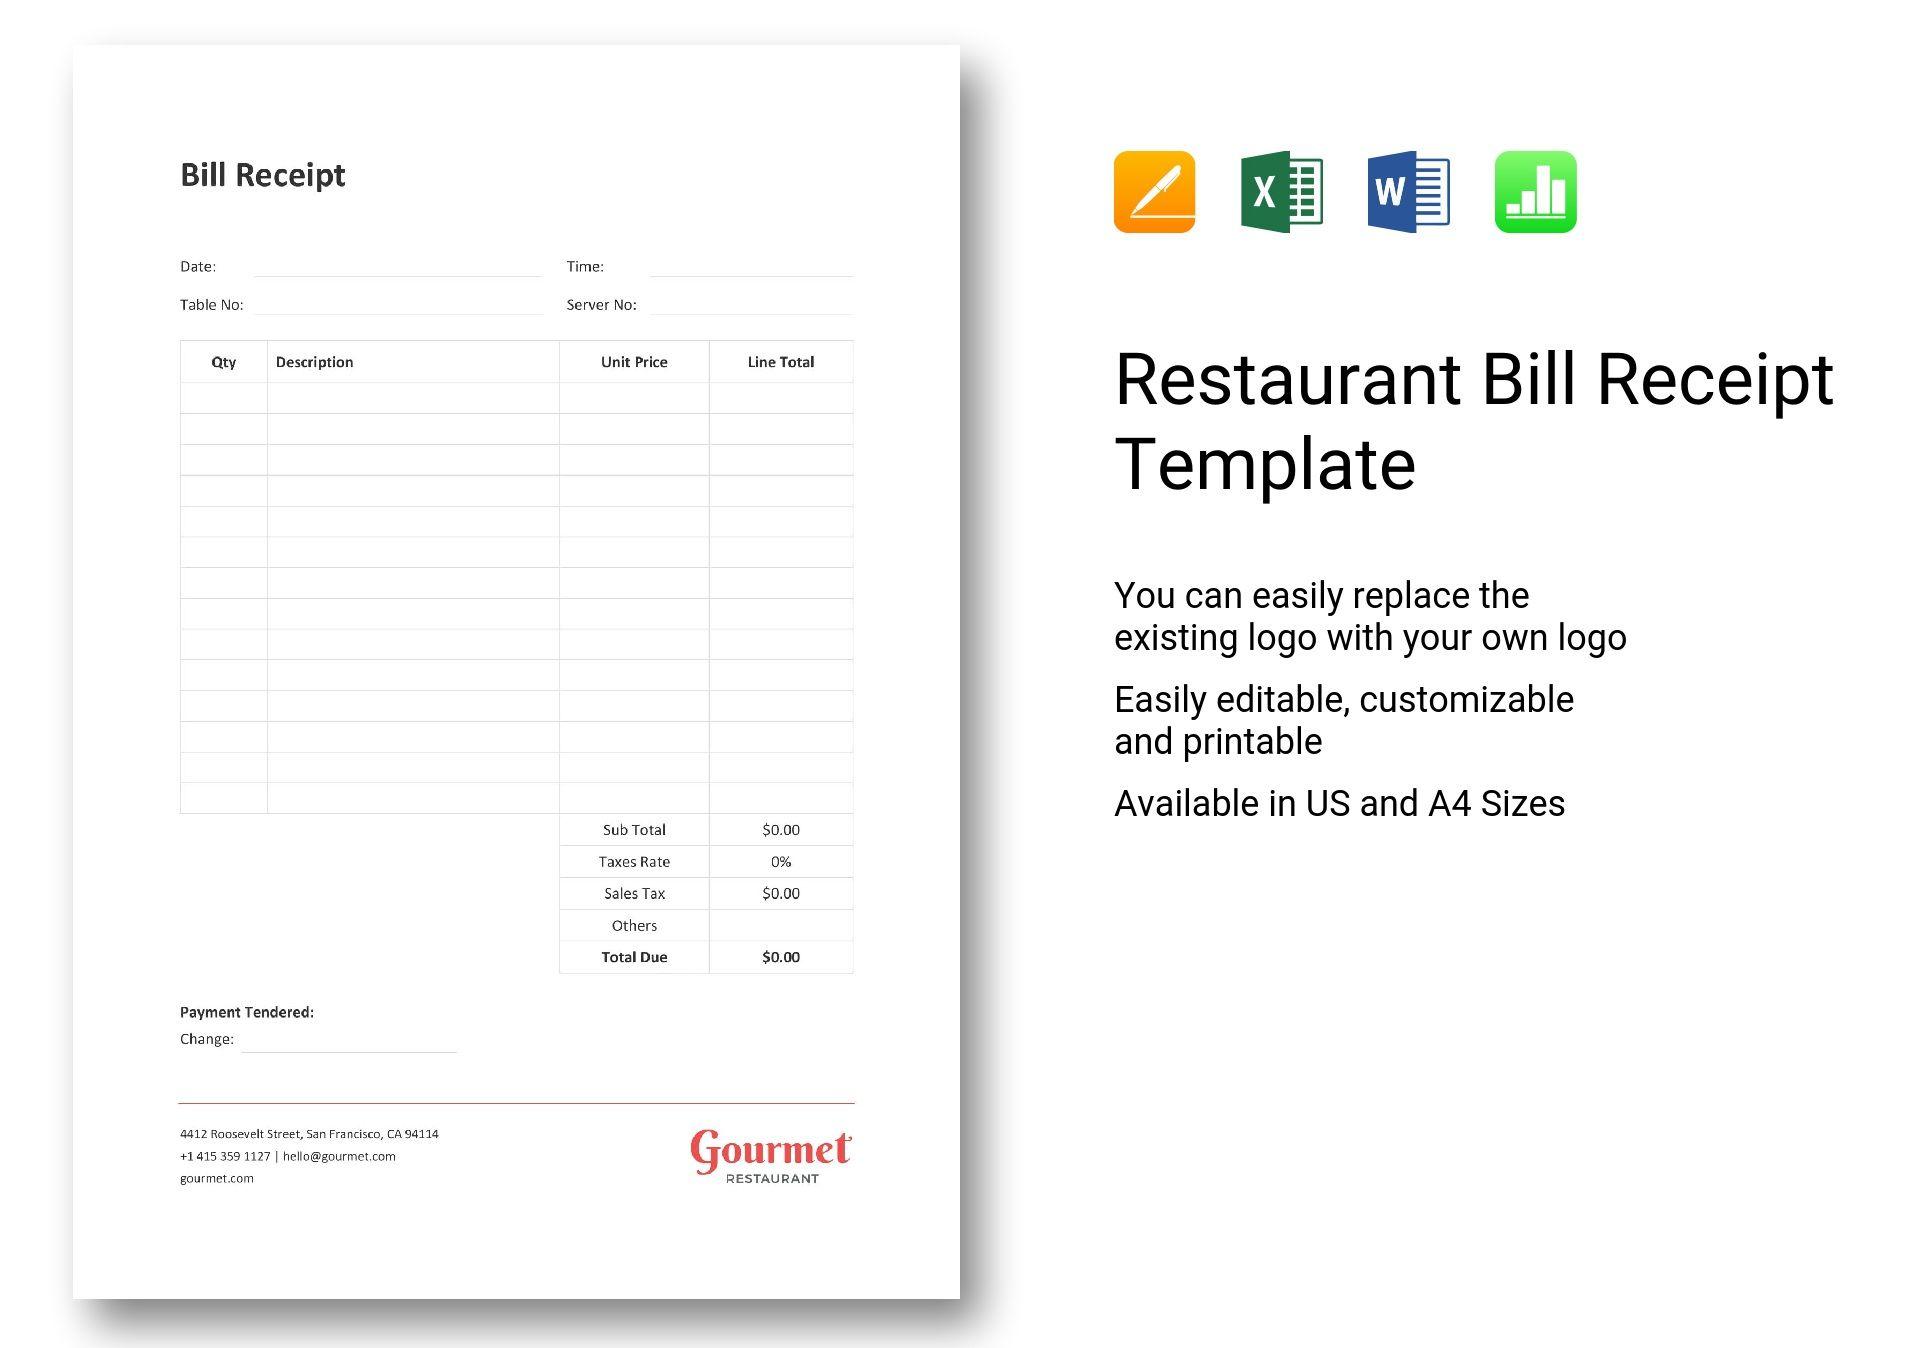 Restaurant Bill Receipt